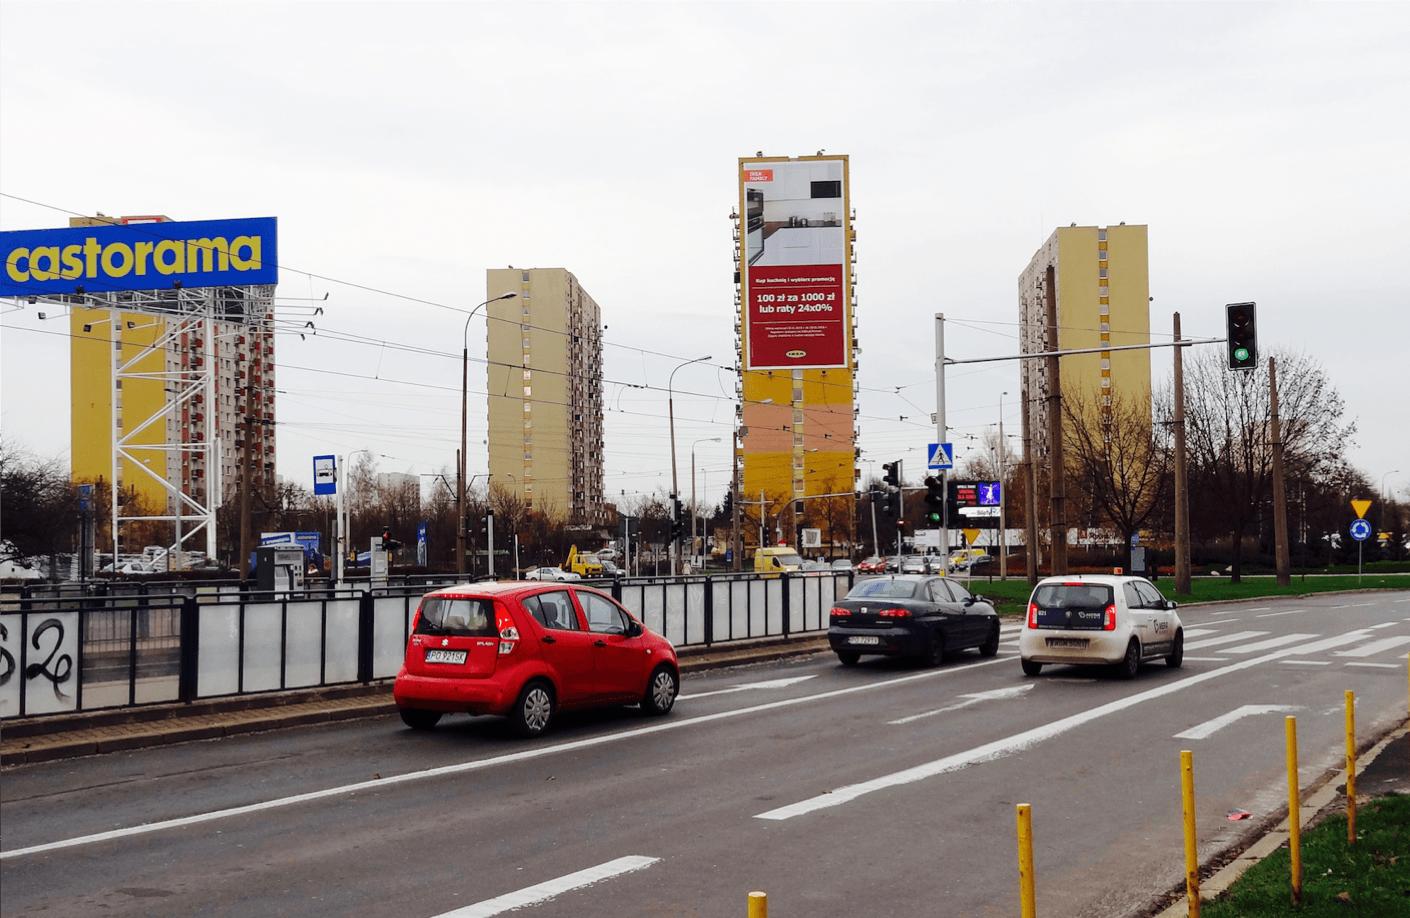 Rondo Solidarnosci Castorama Polskie Meble Biggroup